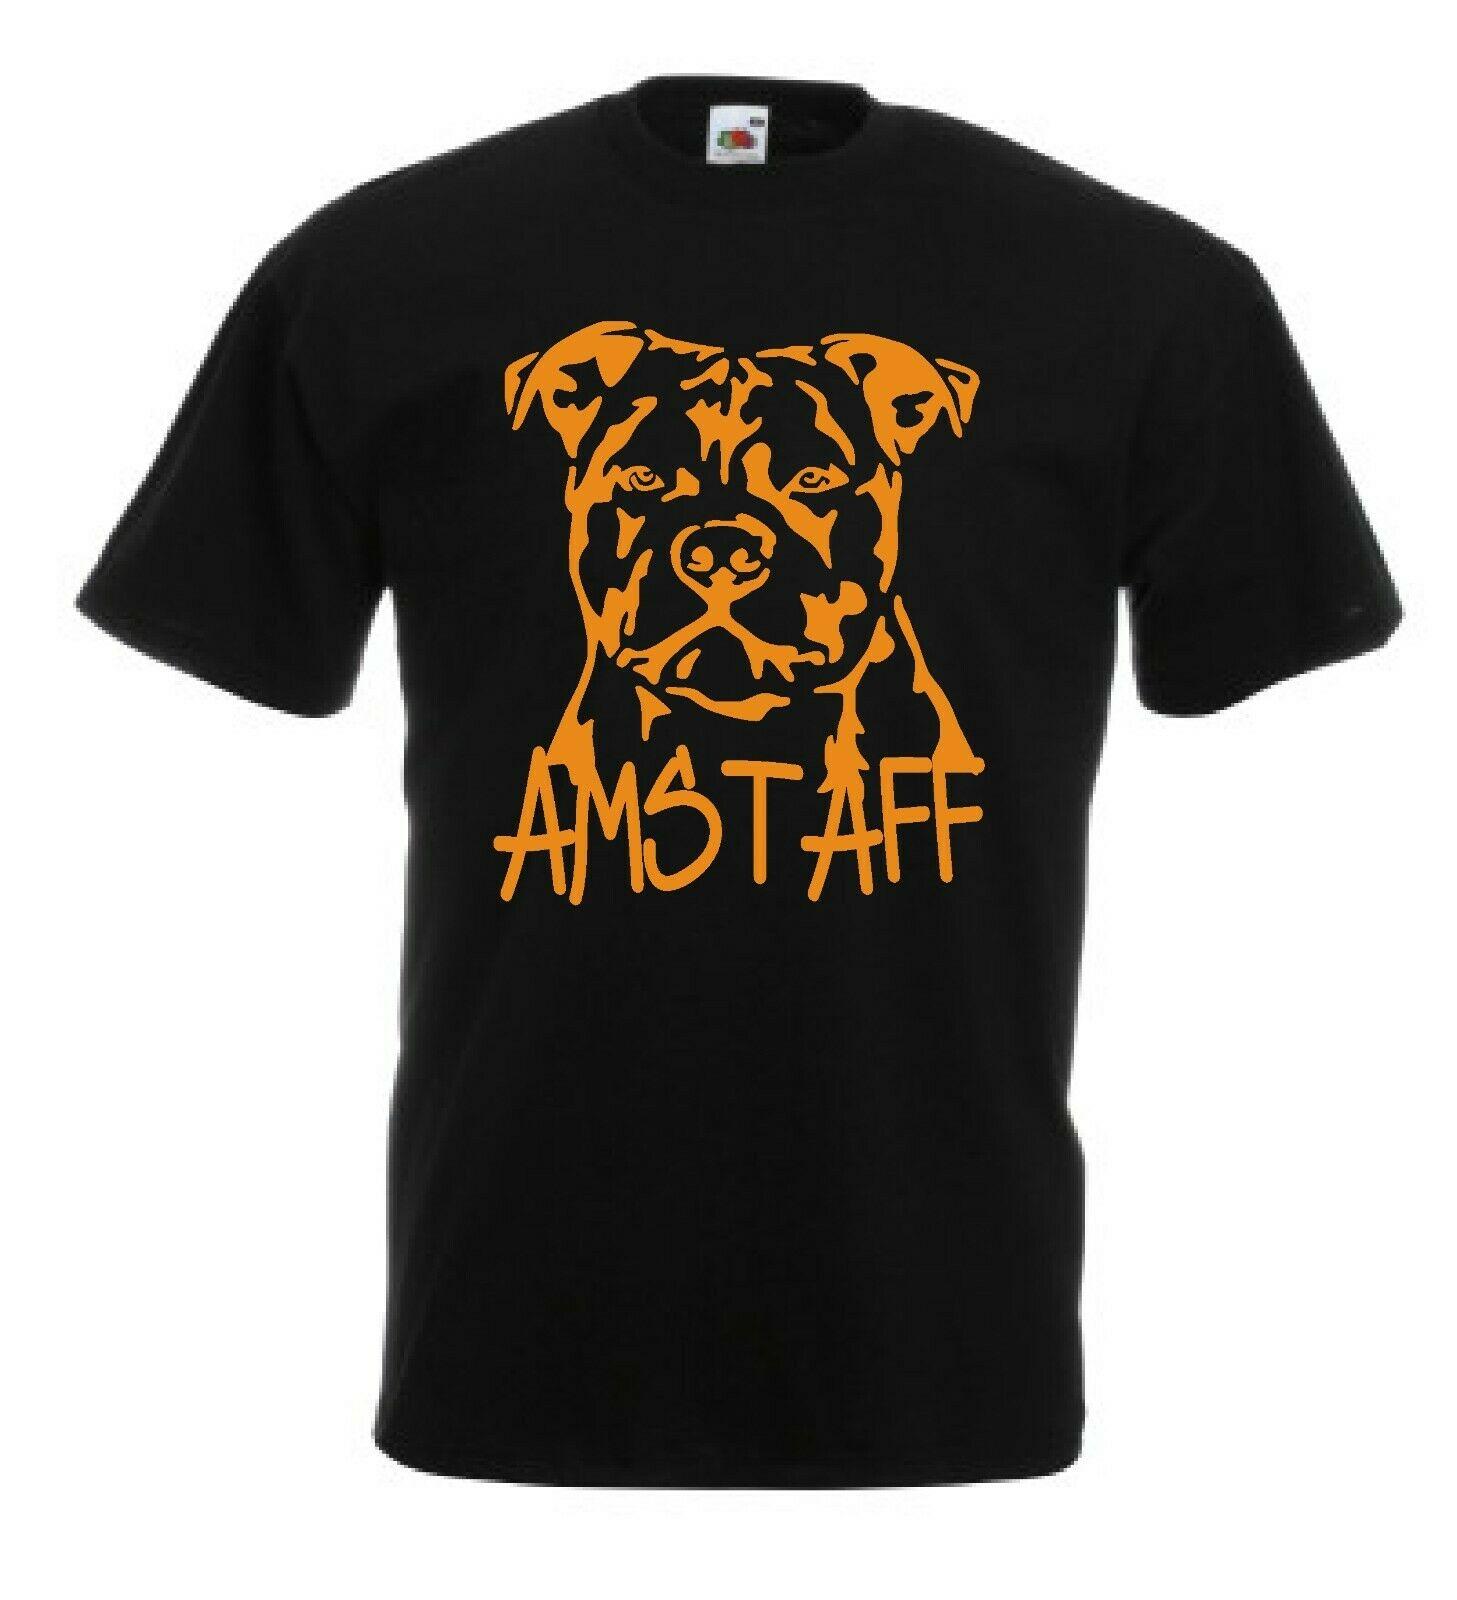 T Shirt Amstaff American Staffordshire Terrier Dog Taglie Anche Per Bambini